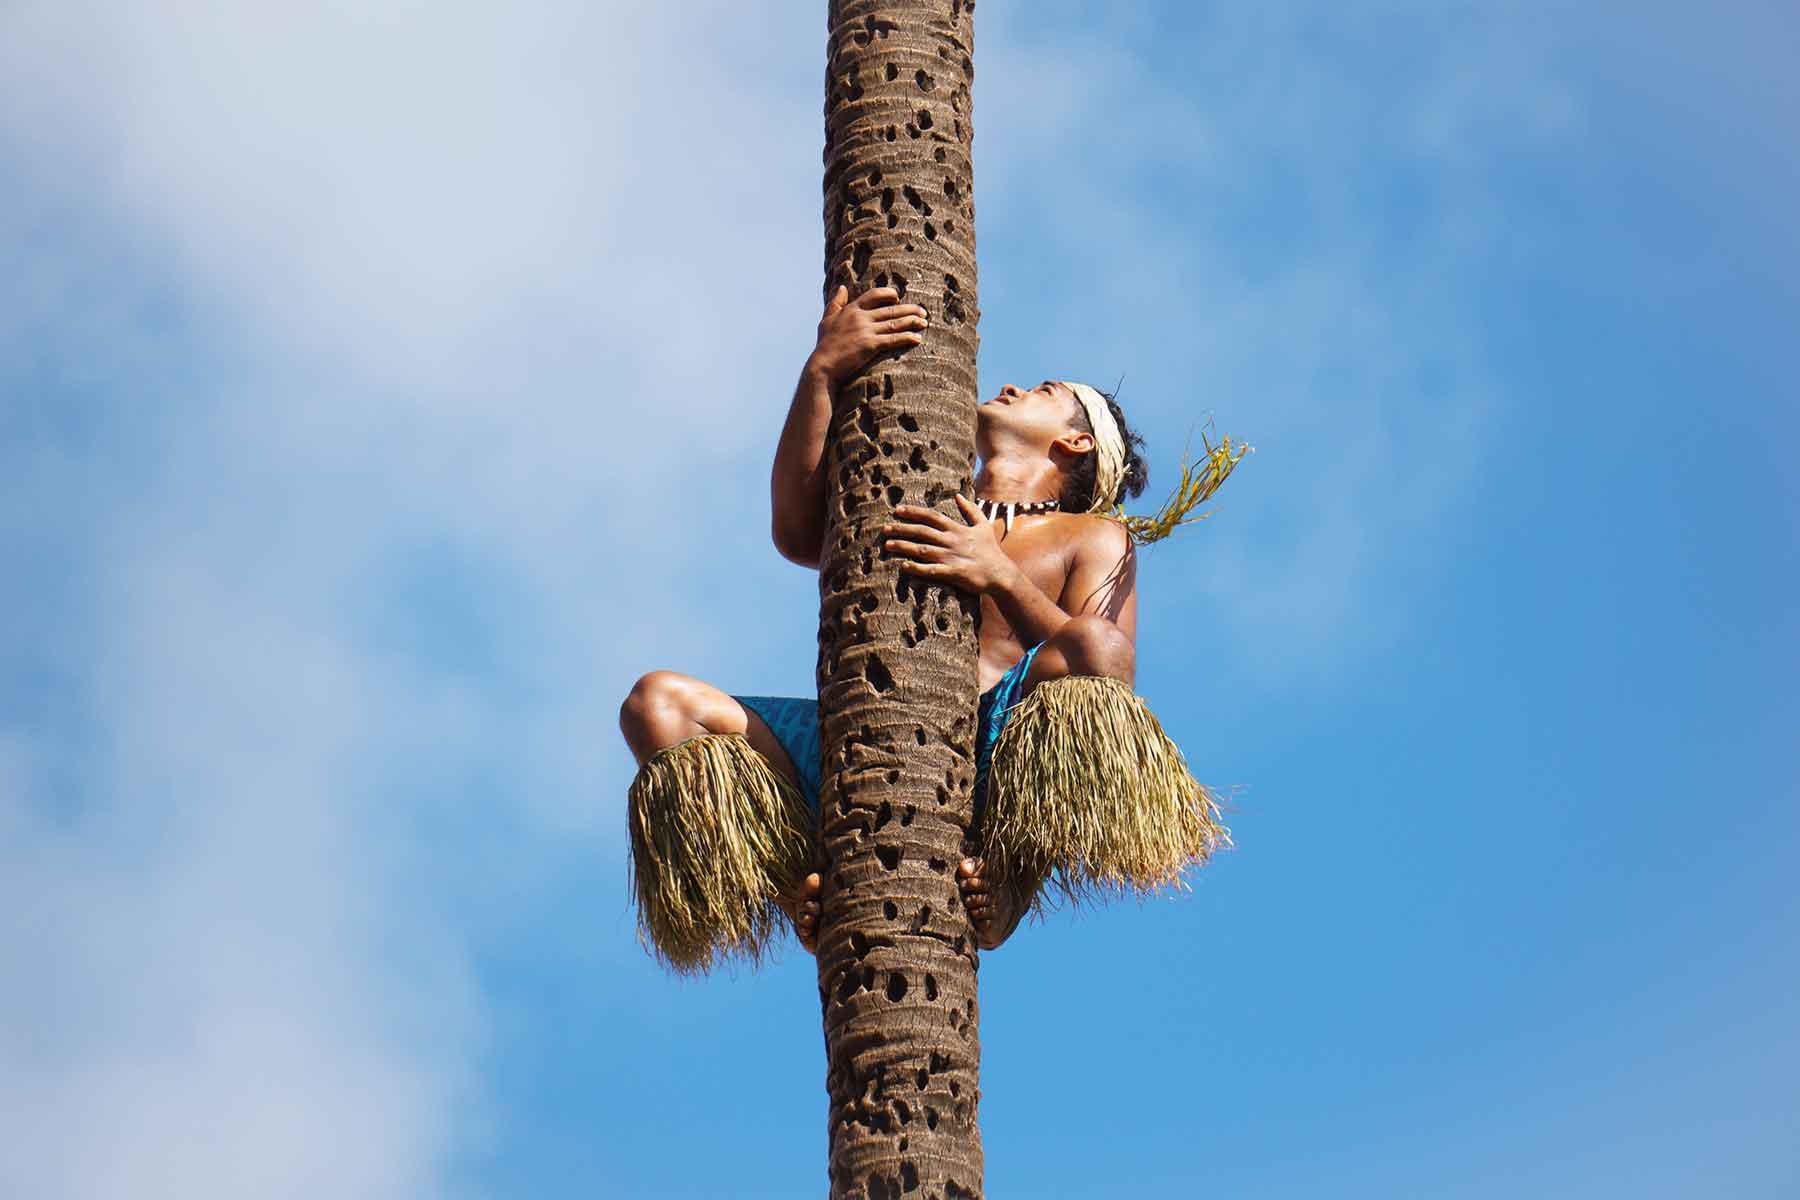 Resor-till-Oceanien-med-Nygren-&-Lind-Resebyrå---polynes-i-palm